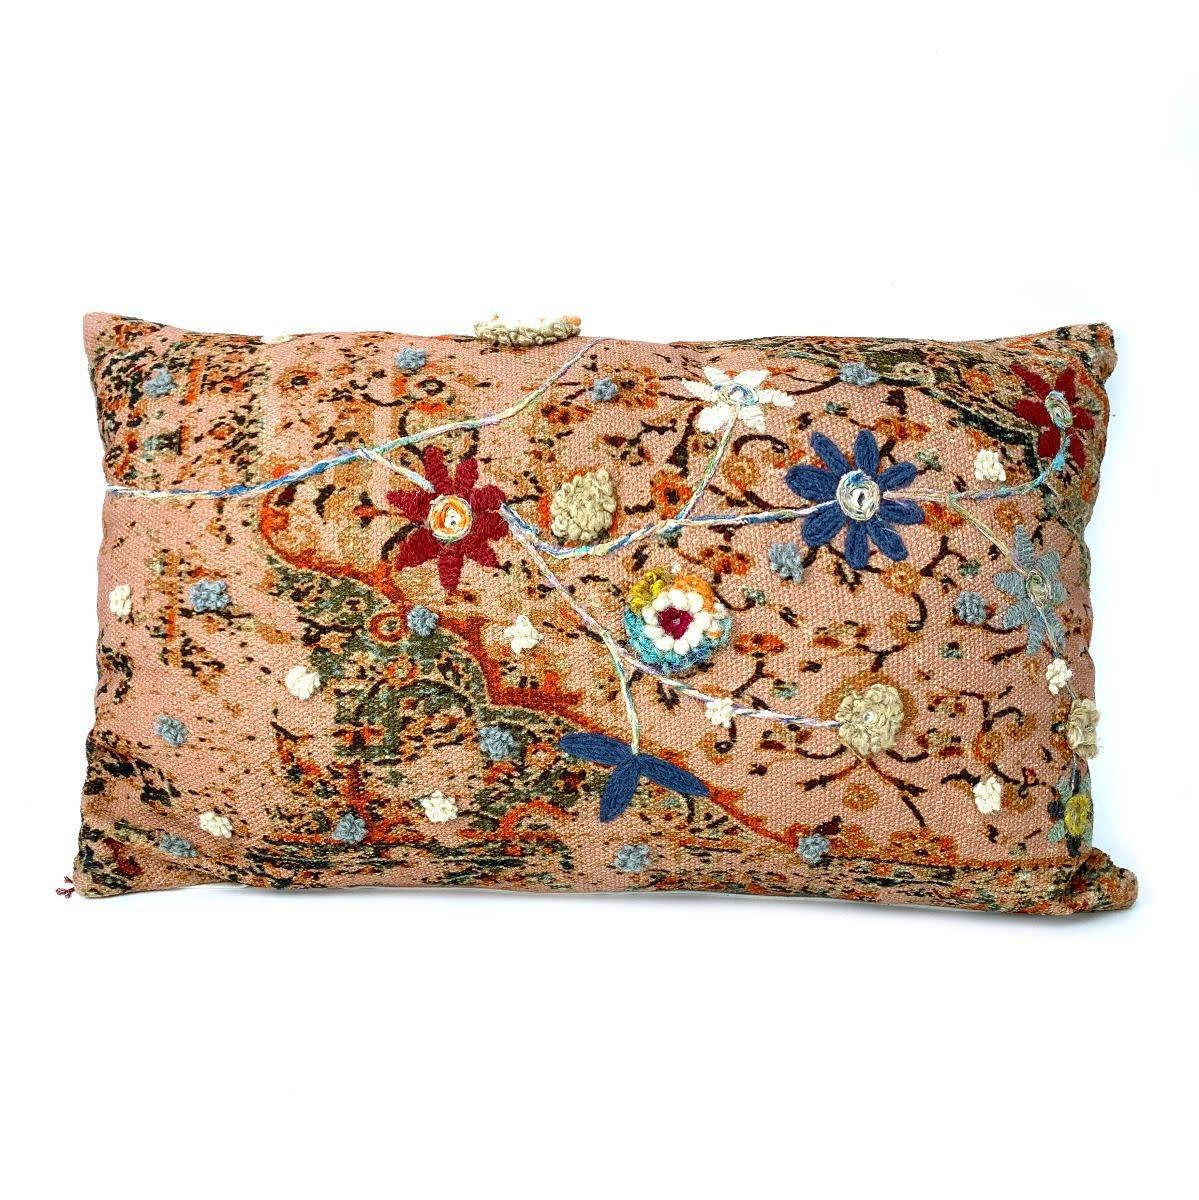 Imbarro Home & Fashion Imbarro Kussen Lolita Roze incl. binnenkussen 45x75cm